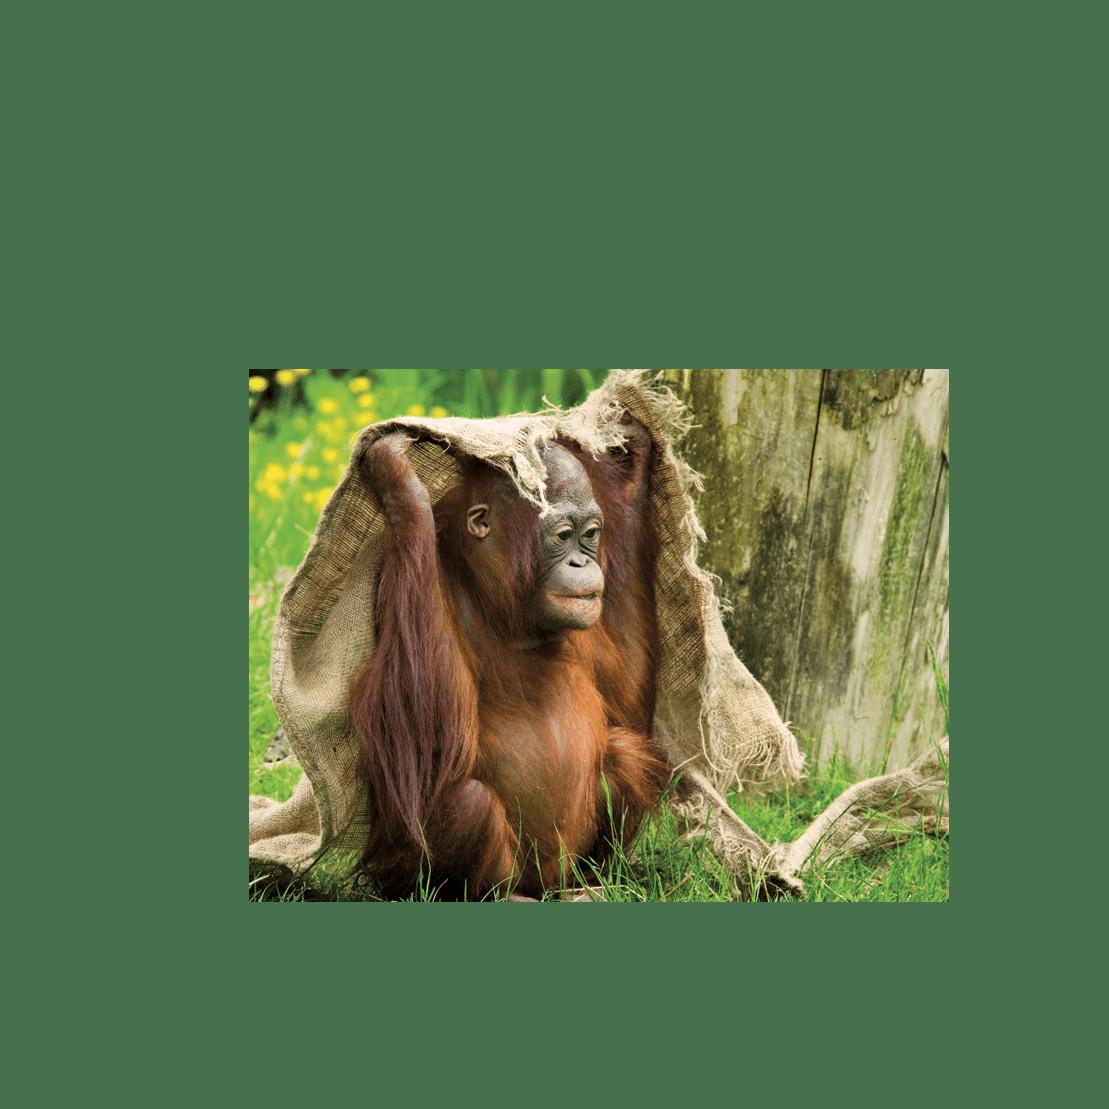 Outlook Expeditions Borneo 2018 - Katie Mcknight